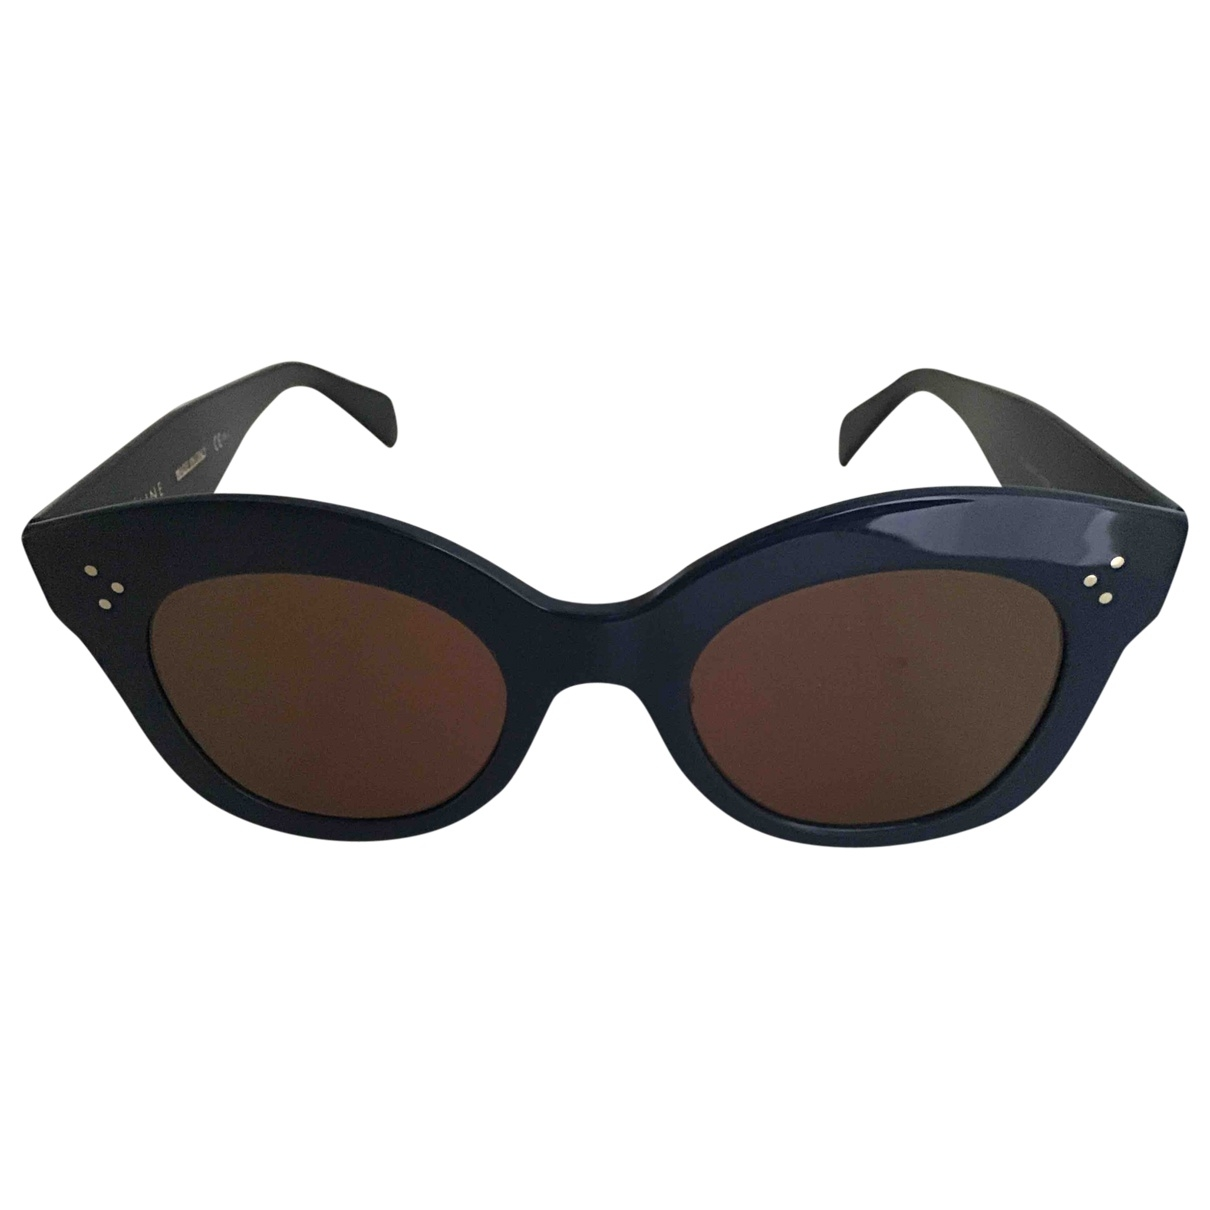 Gafas Caty Celine